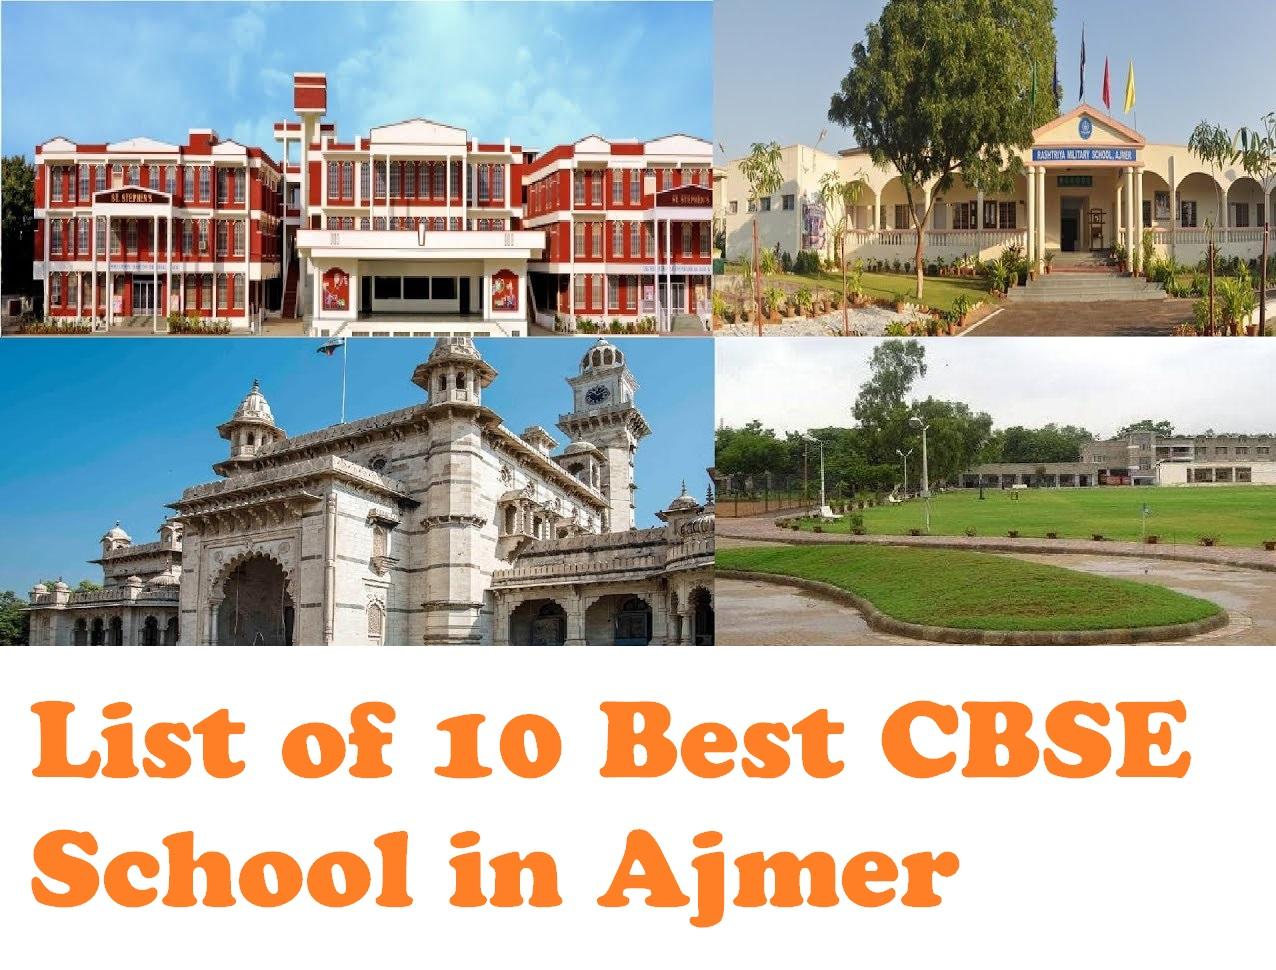 List of 10 Best CBSE Schools in Ajmer, Rajasthan